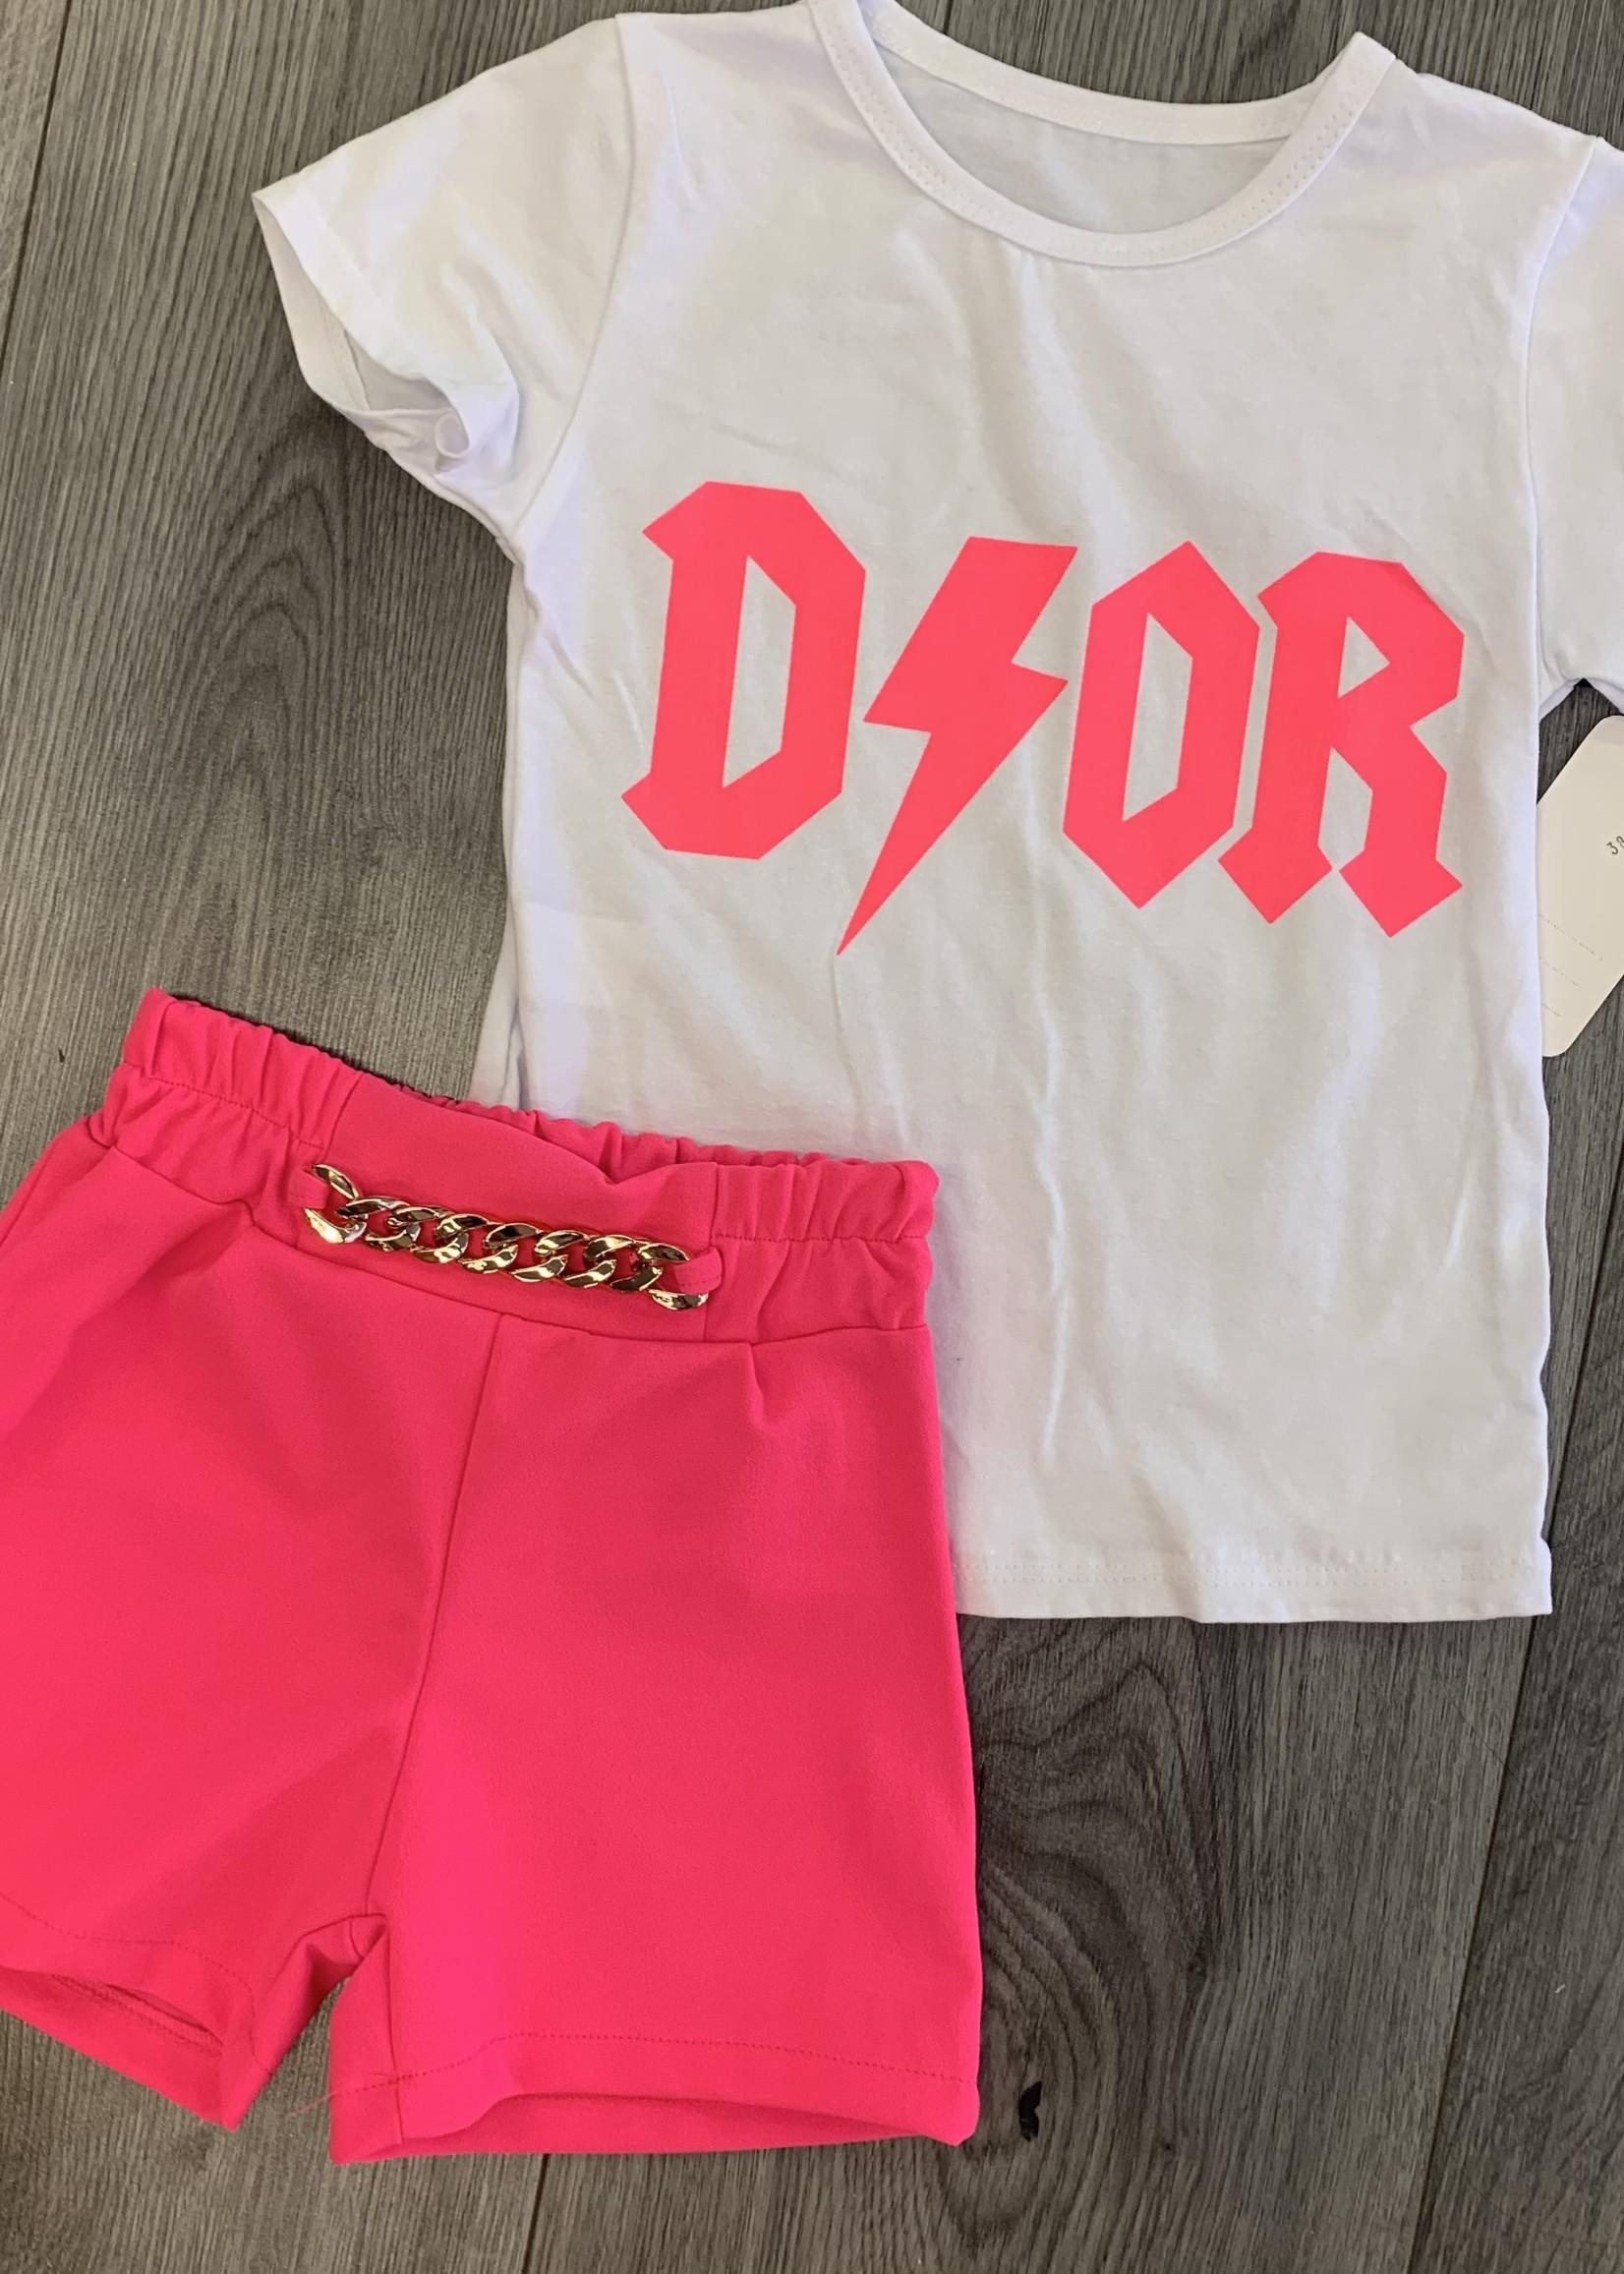 Divanis Divanis Dior set pink